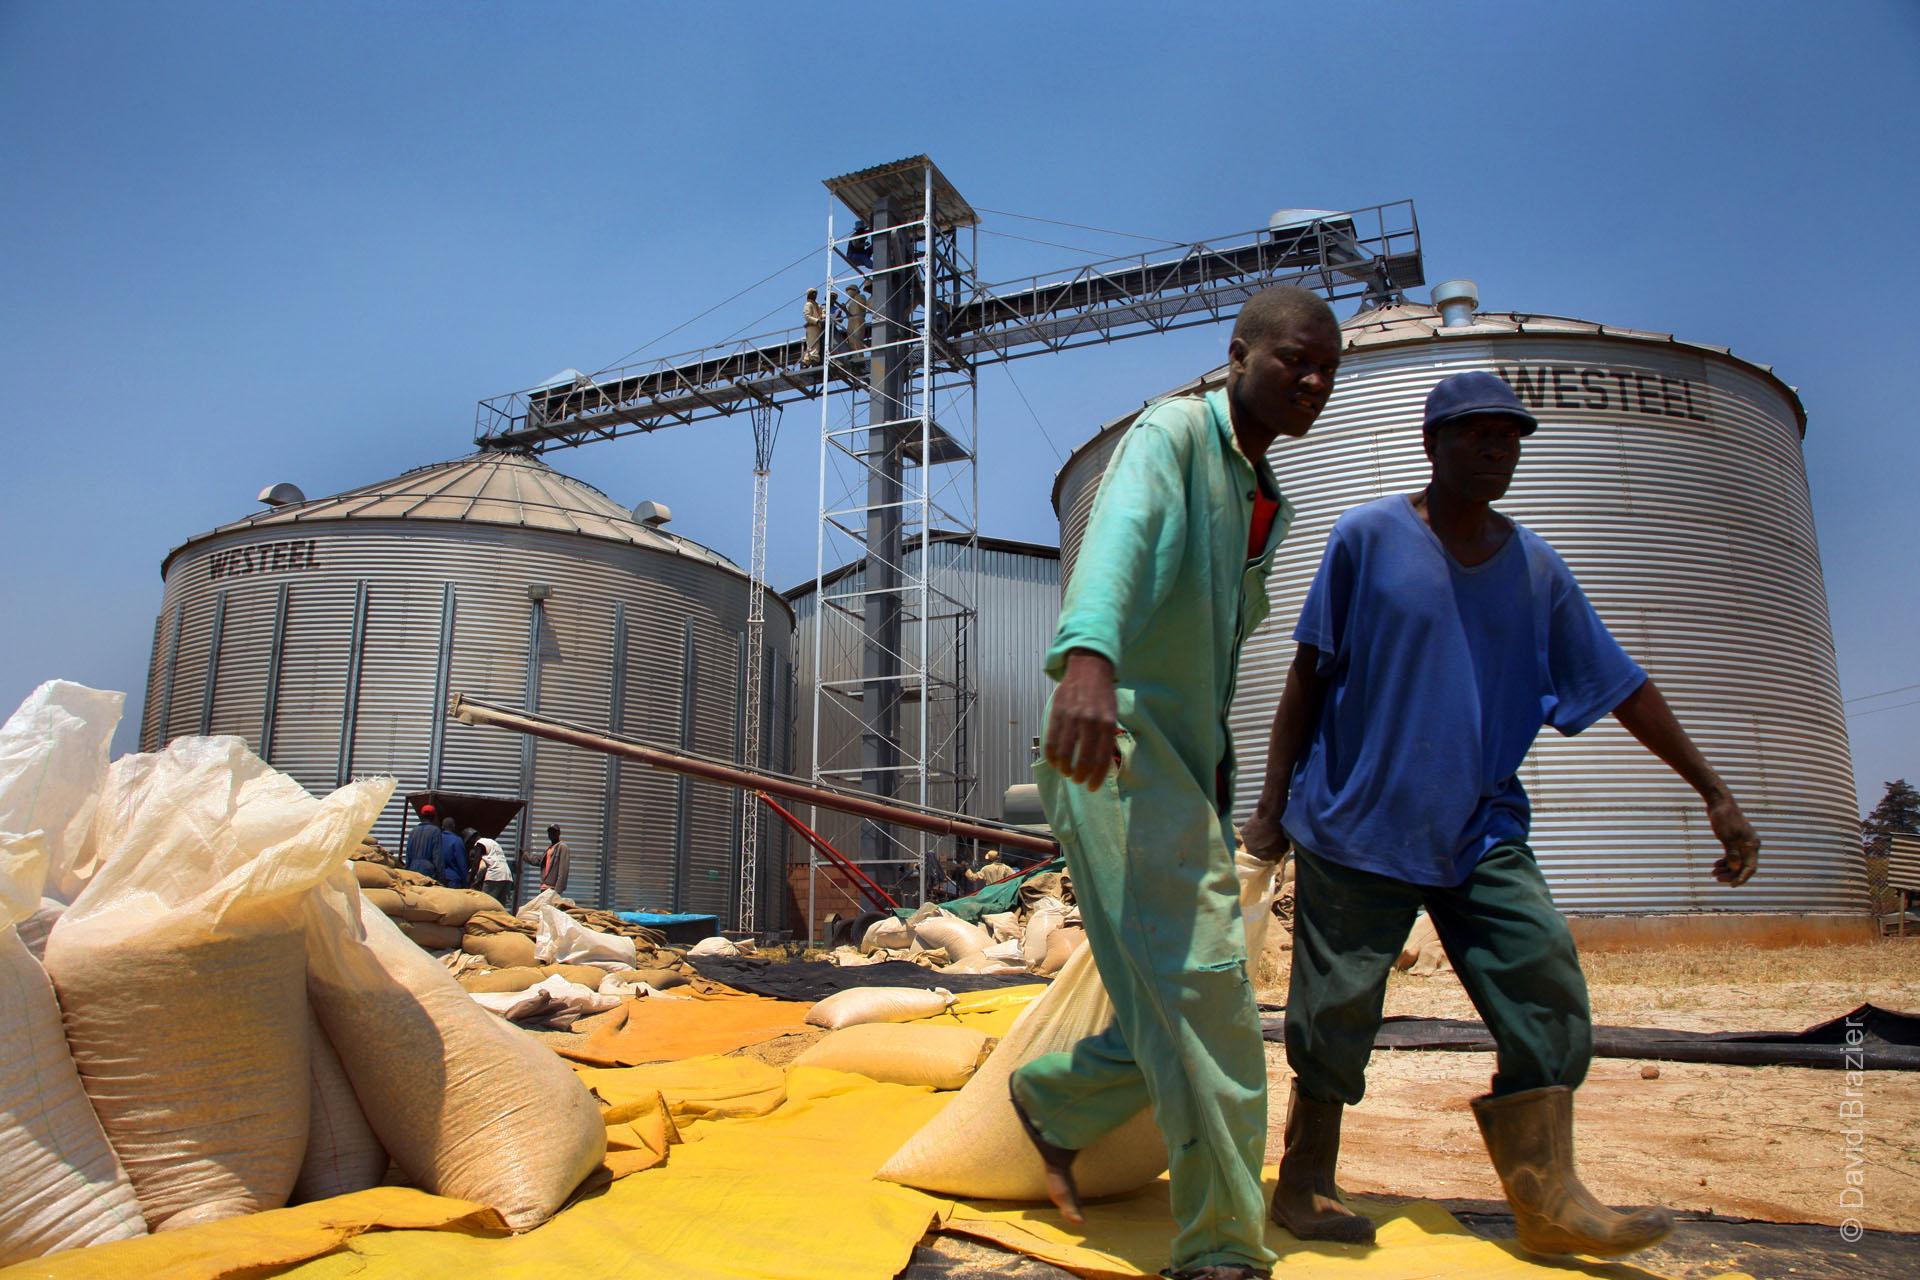 African workers dragging sacks of grain